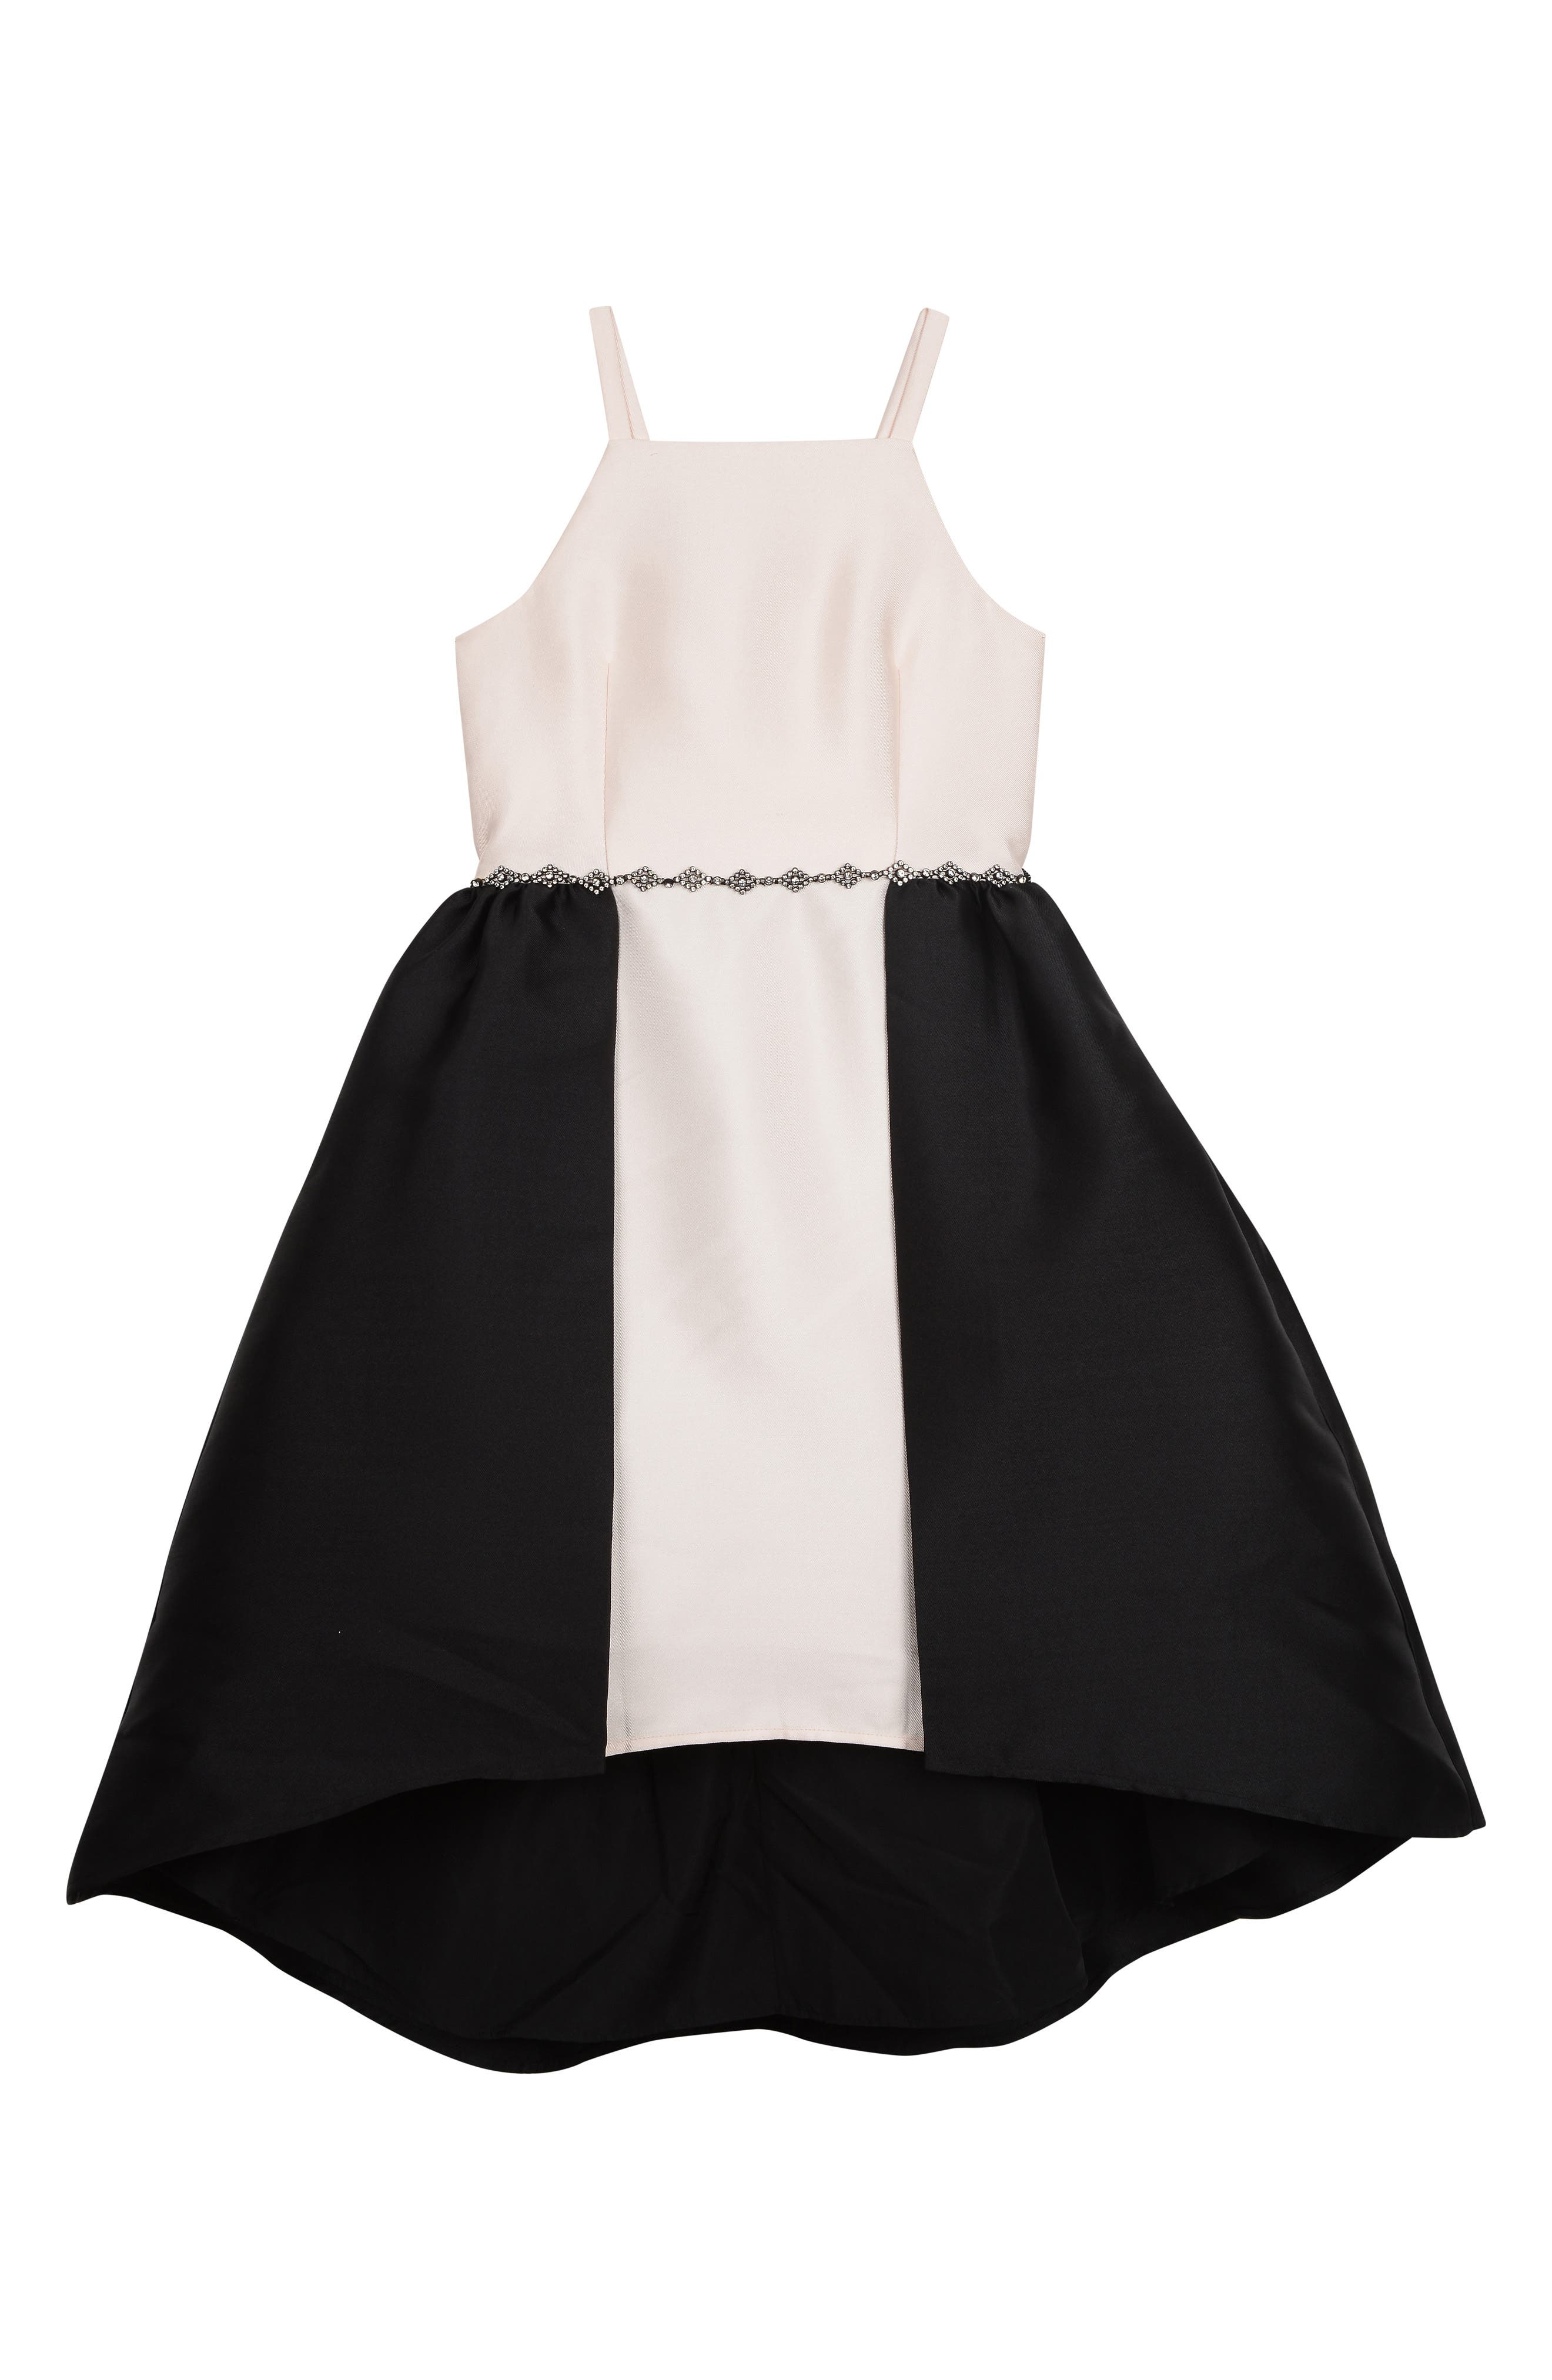 BADGLEY MISCHKA COLLECTION, Badgley Mischka Colorblock Sleeveless Dress, Main thumbnail 1, color, BLACK/ IVORY